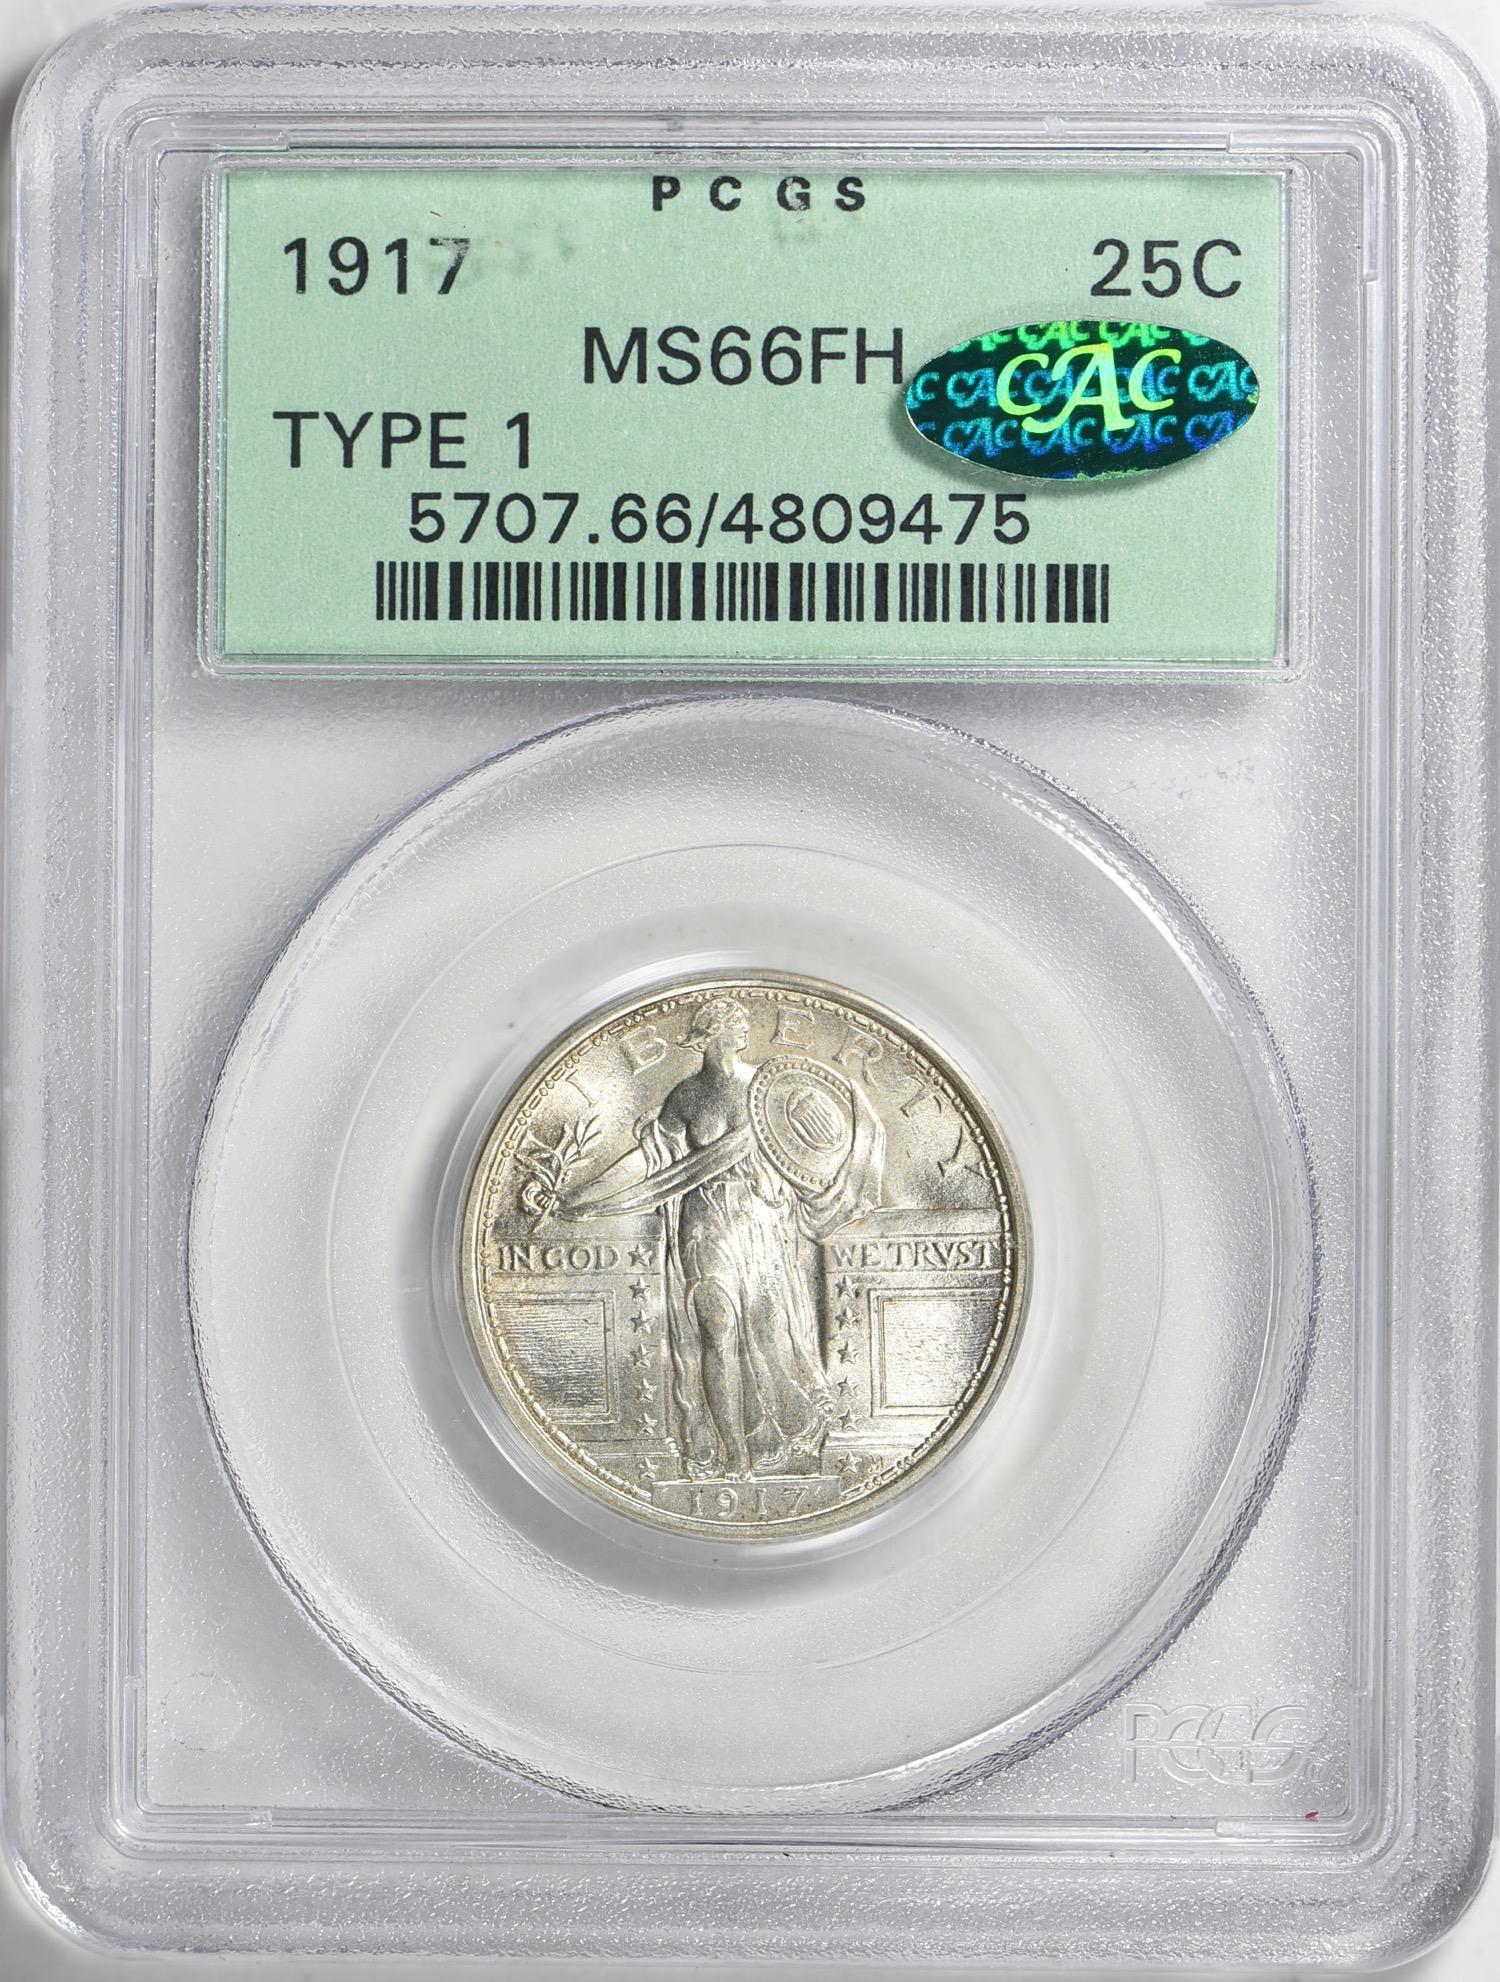 1917 4809475 Obverse Type 1 MS66FH CAC OGH.jpg